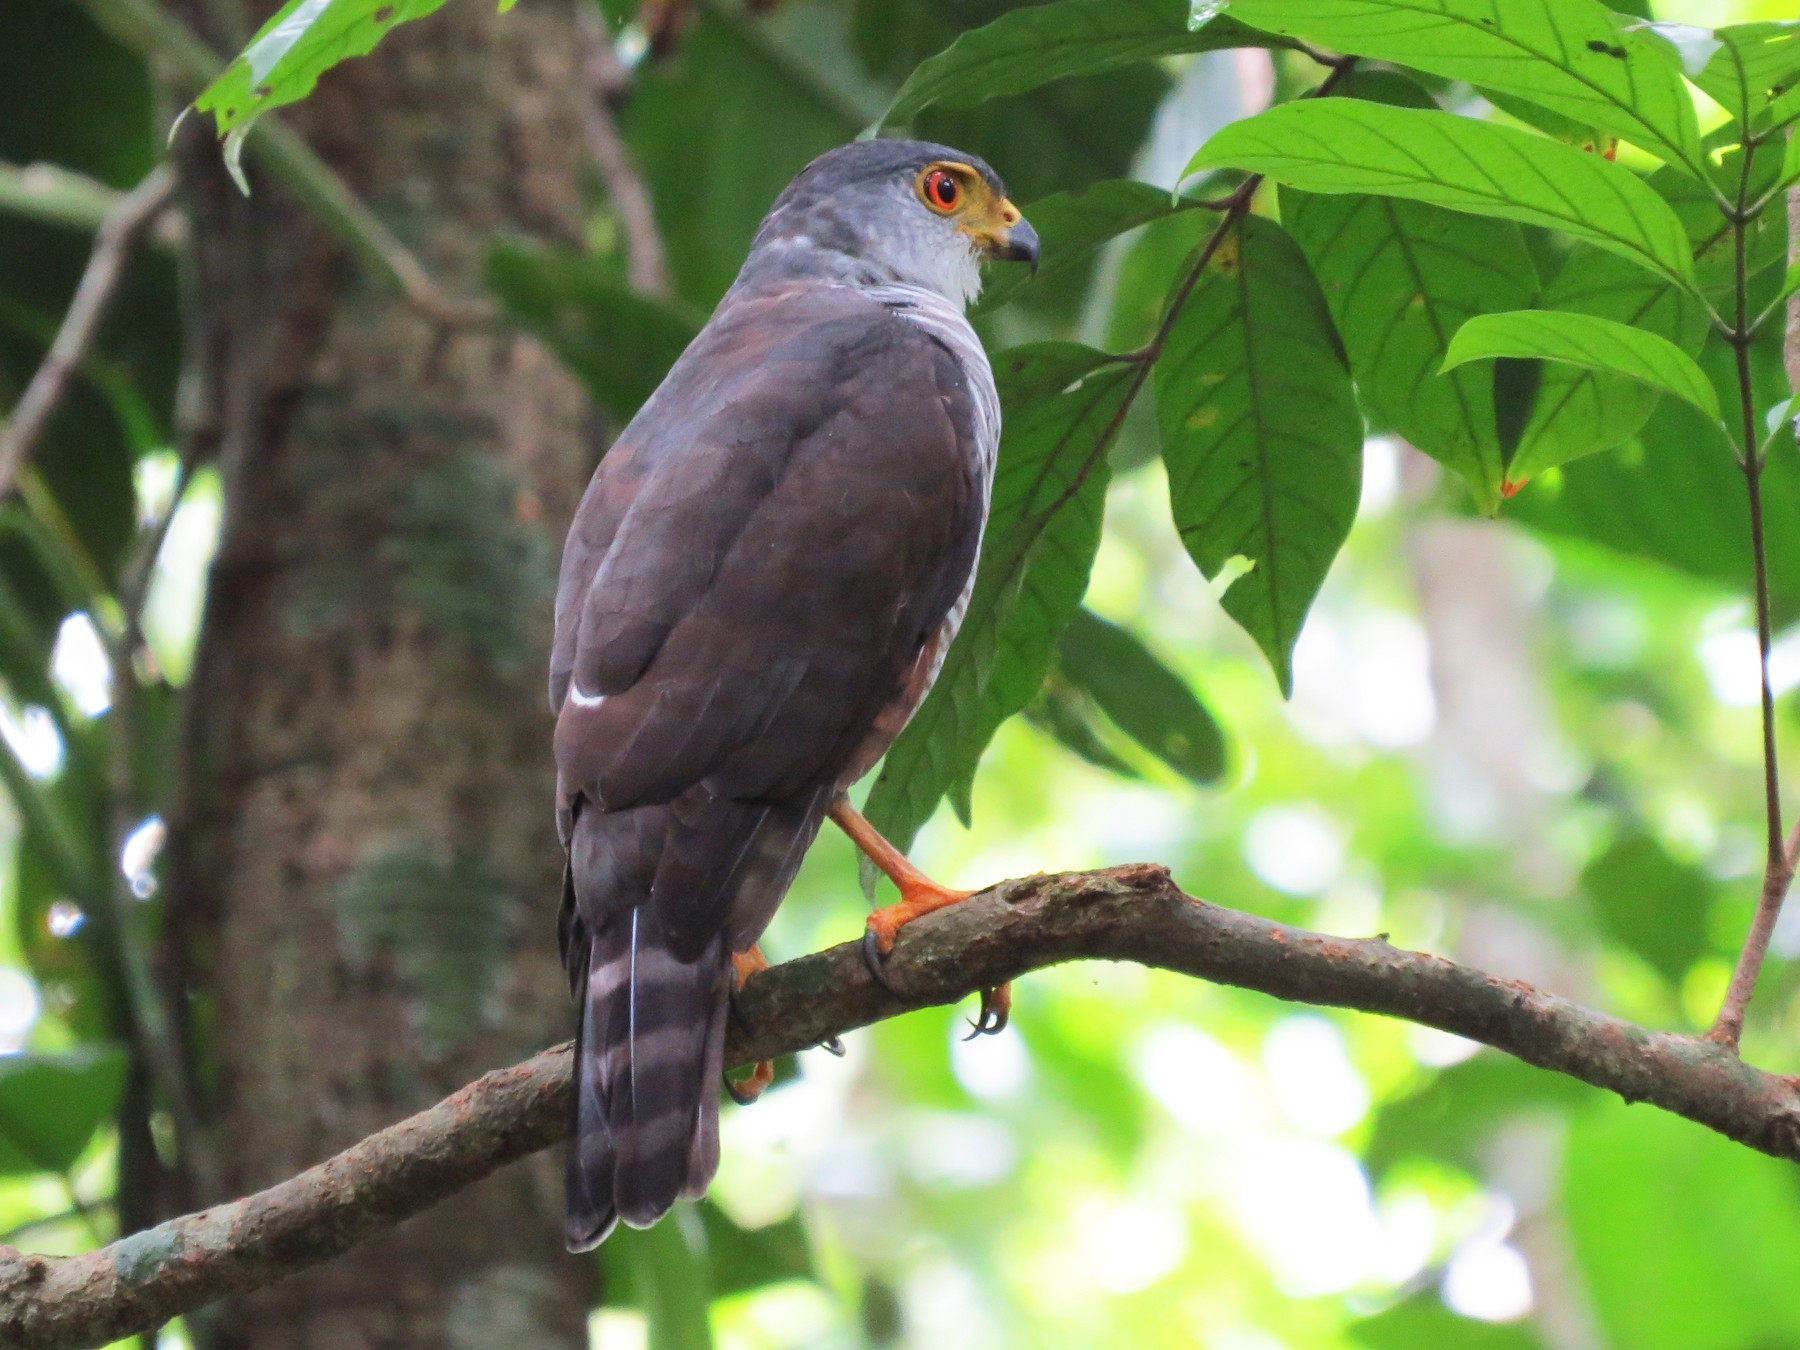 Tiny Hawk - Mariló C. Castro